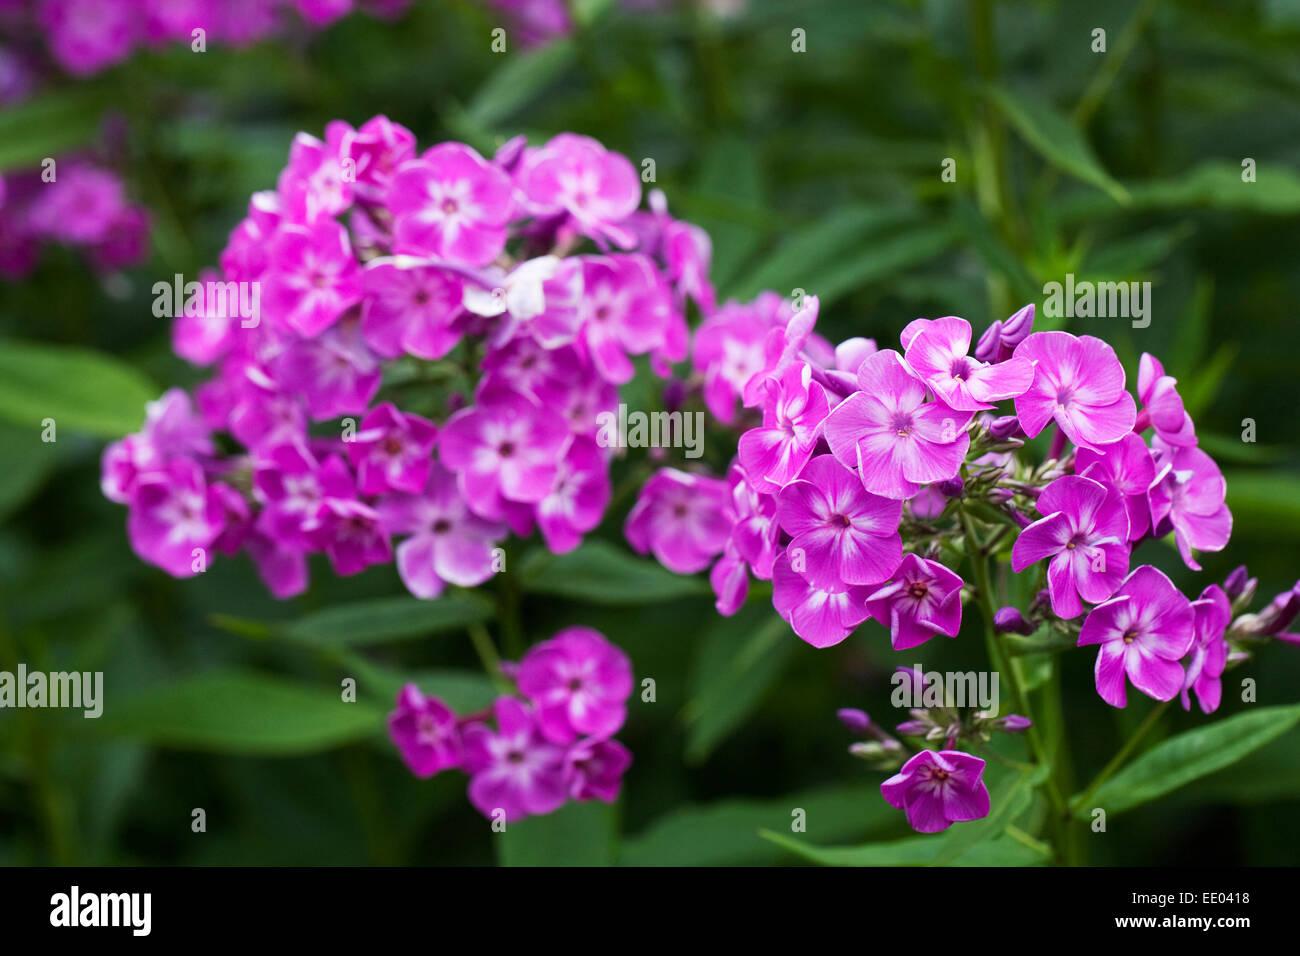 Phlox paniculata 'Fancy Feelings'. - Stock Image